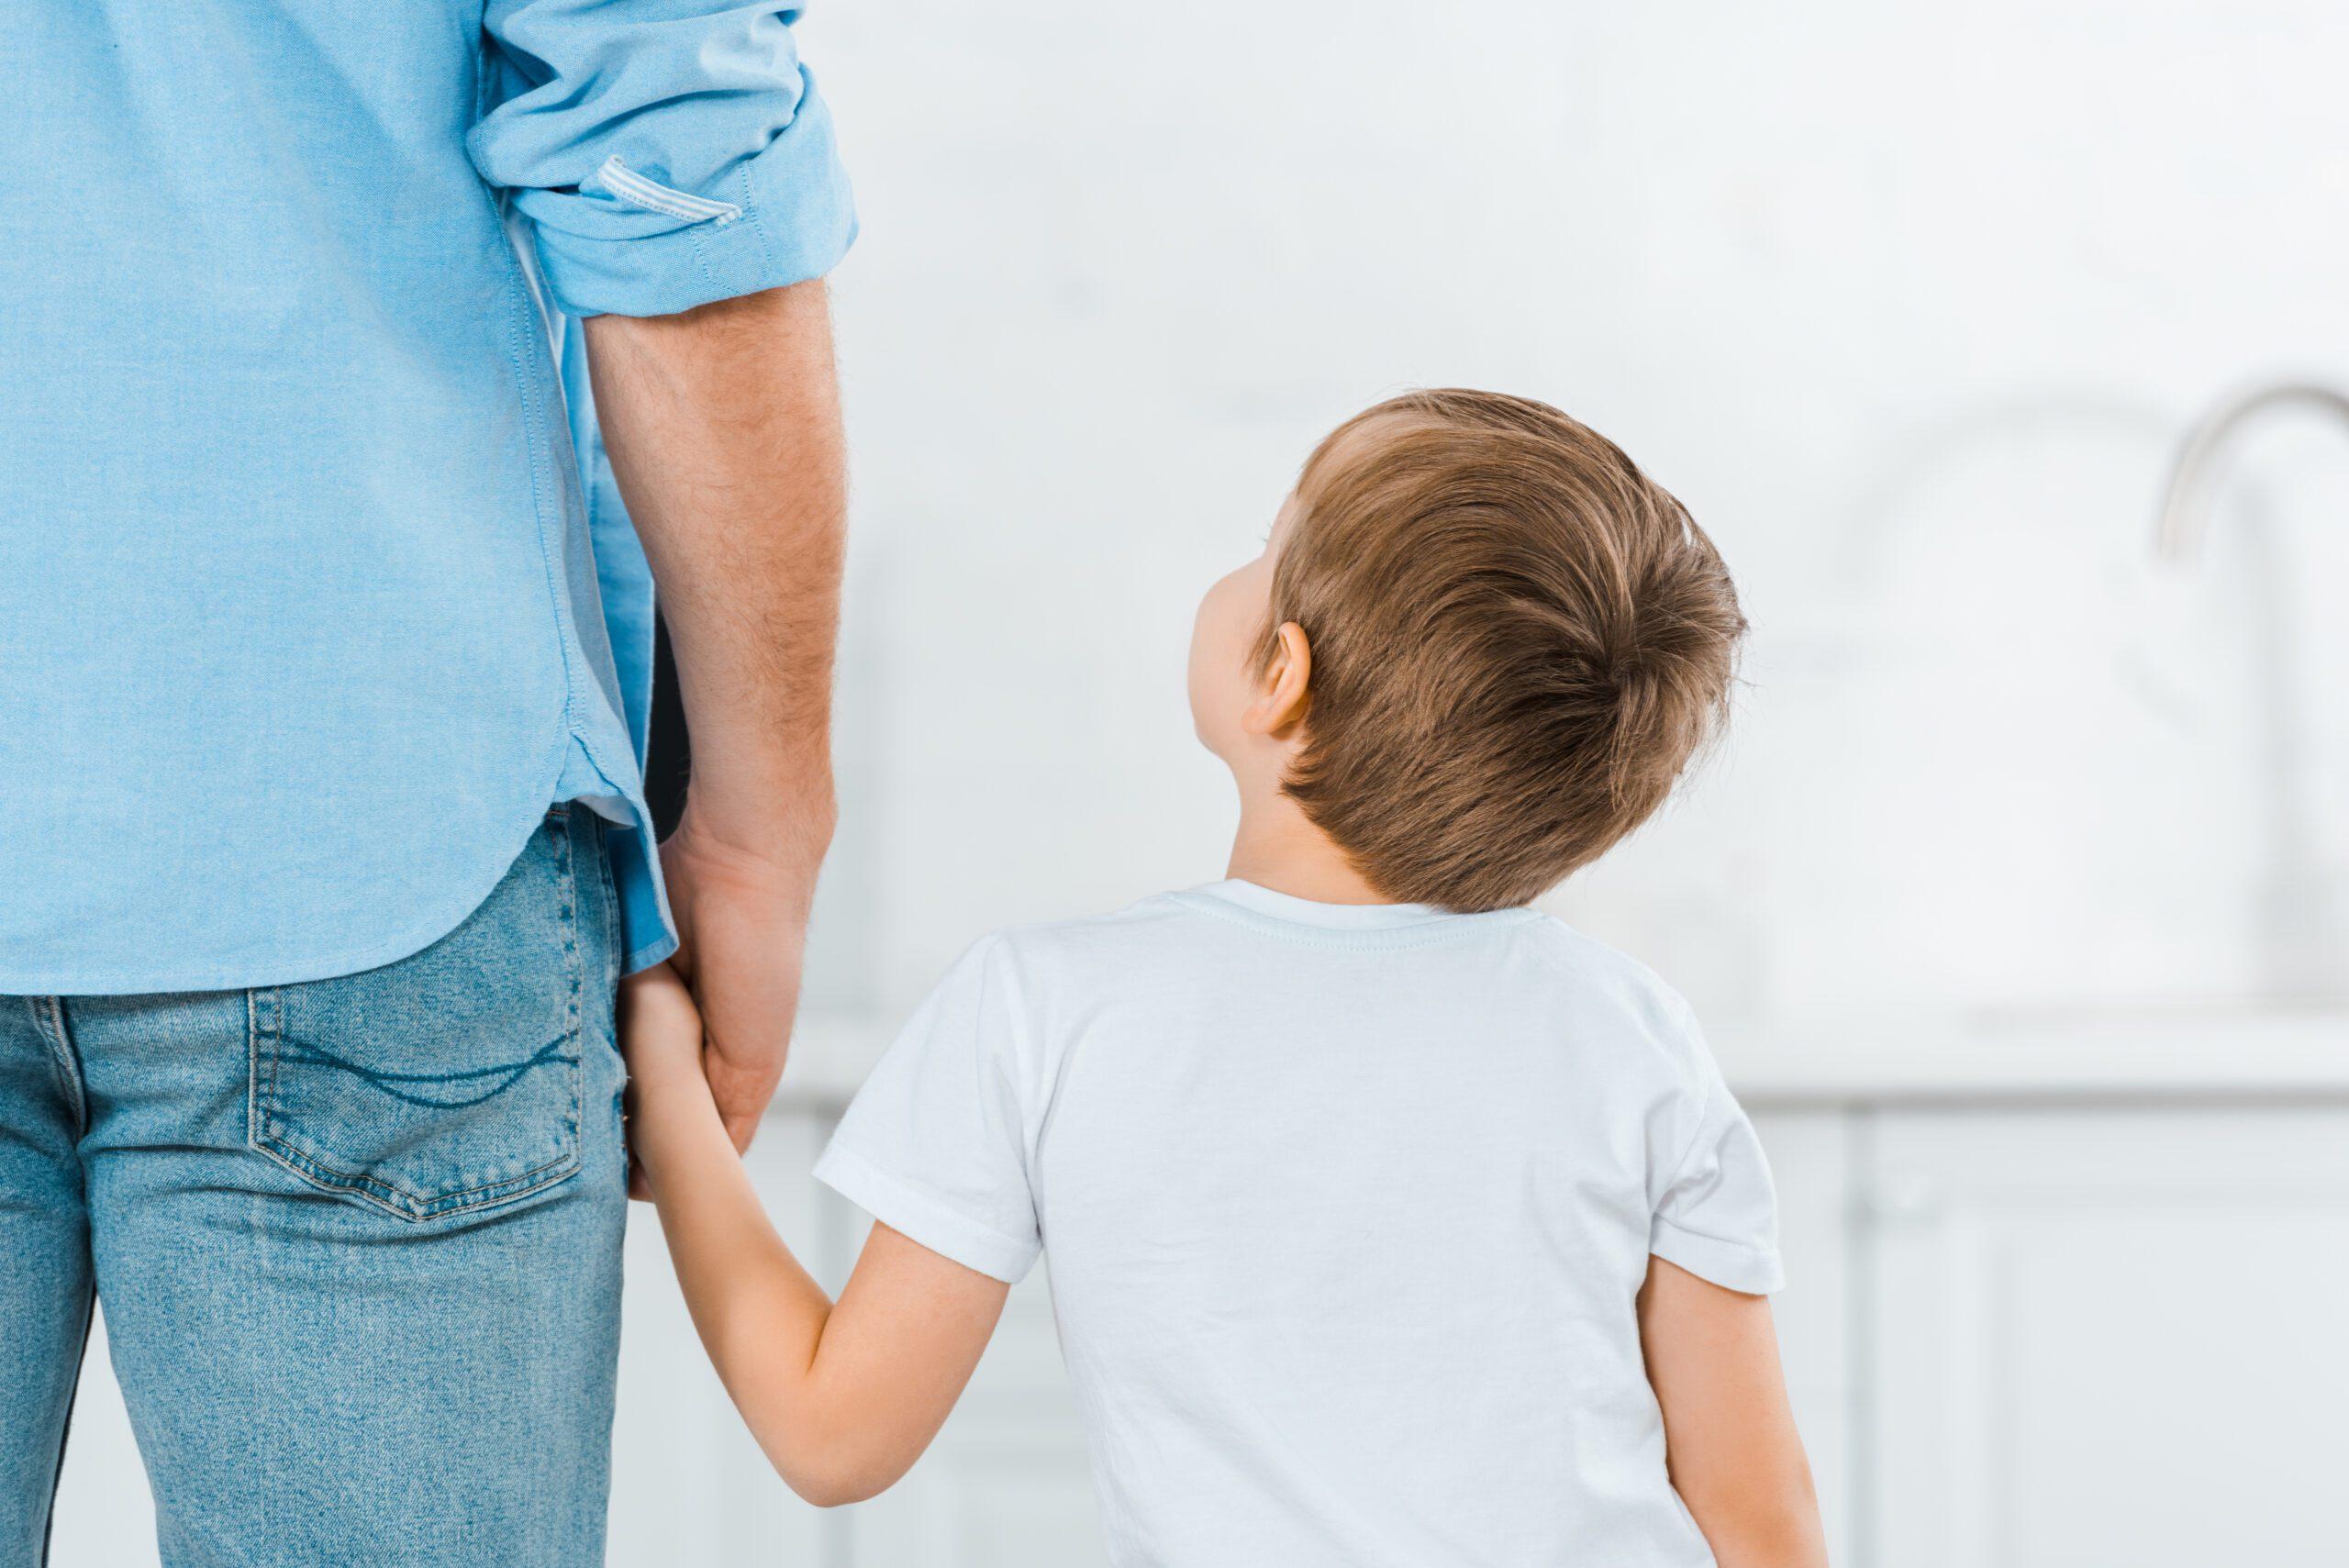 BEN'S ZONE: The Fragility Of Fatherhood